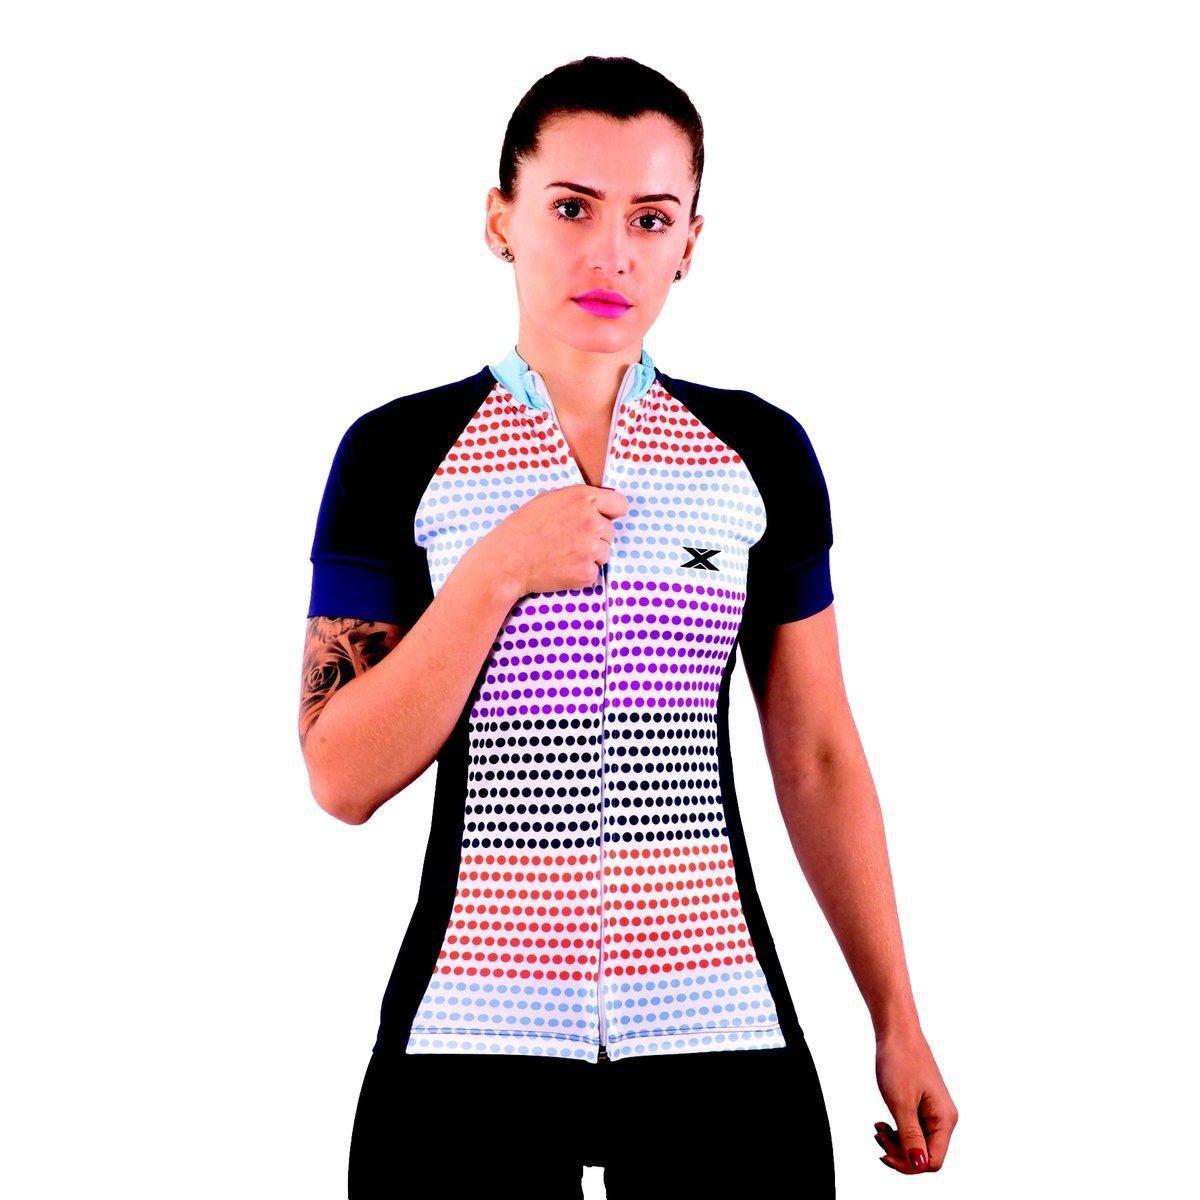 CYCLE 81007 Feminina Ciclismo Azul Camisa DX3 Camisa DX3 w1HZHt